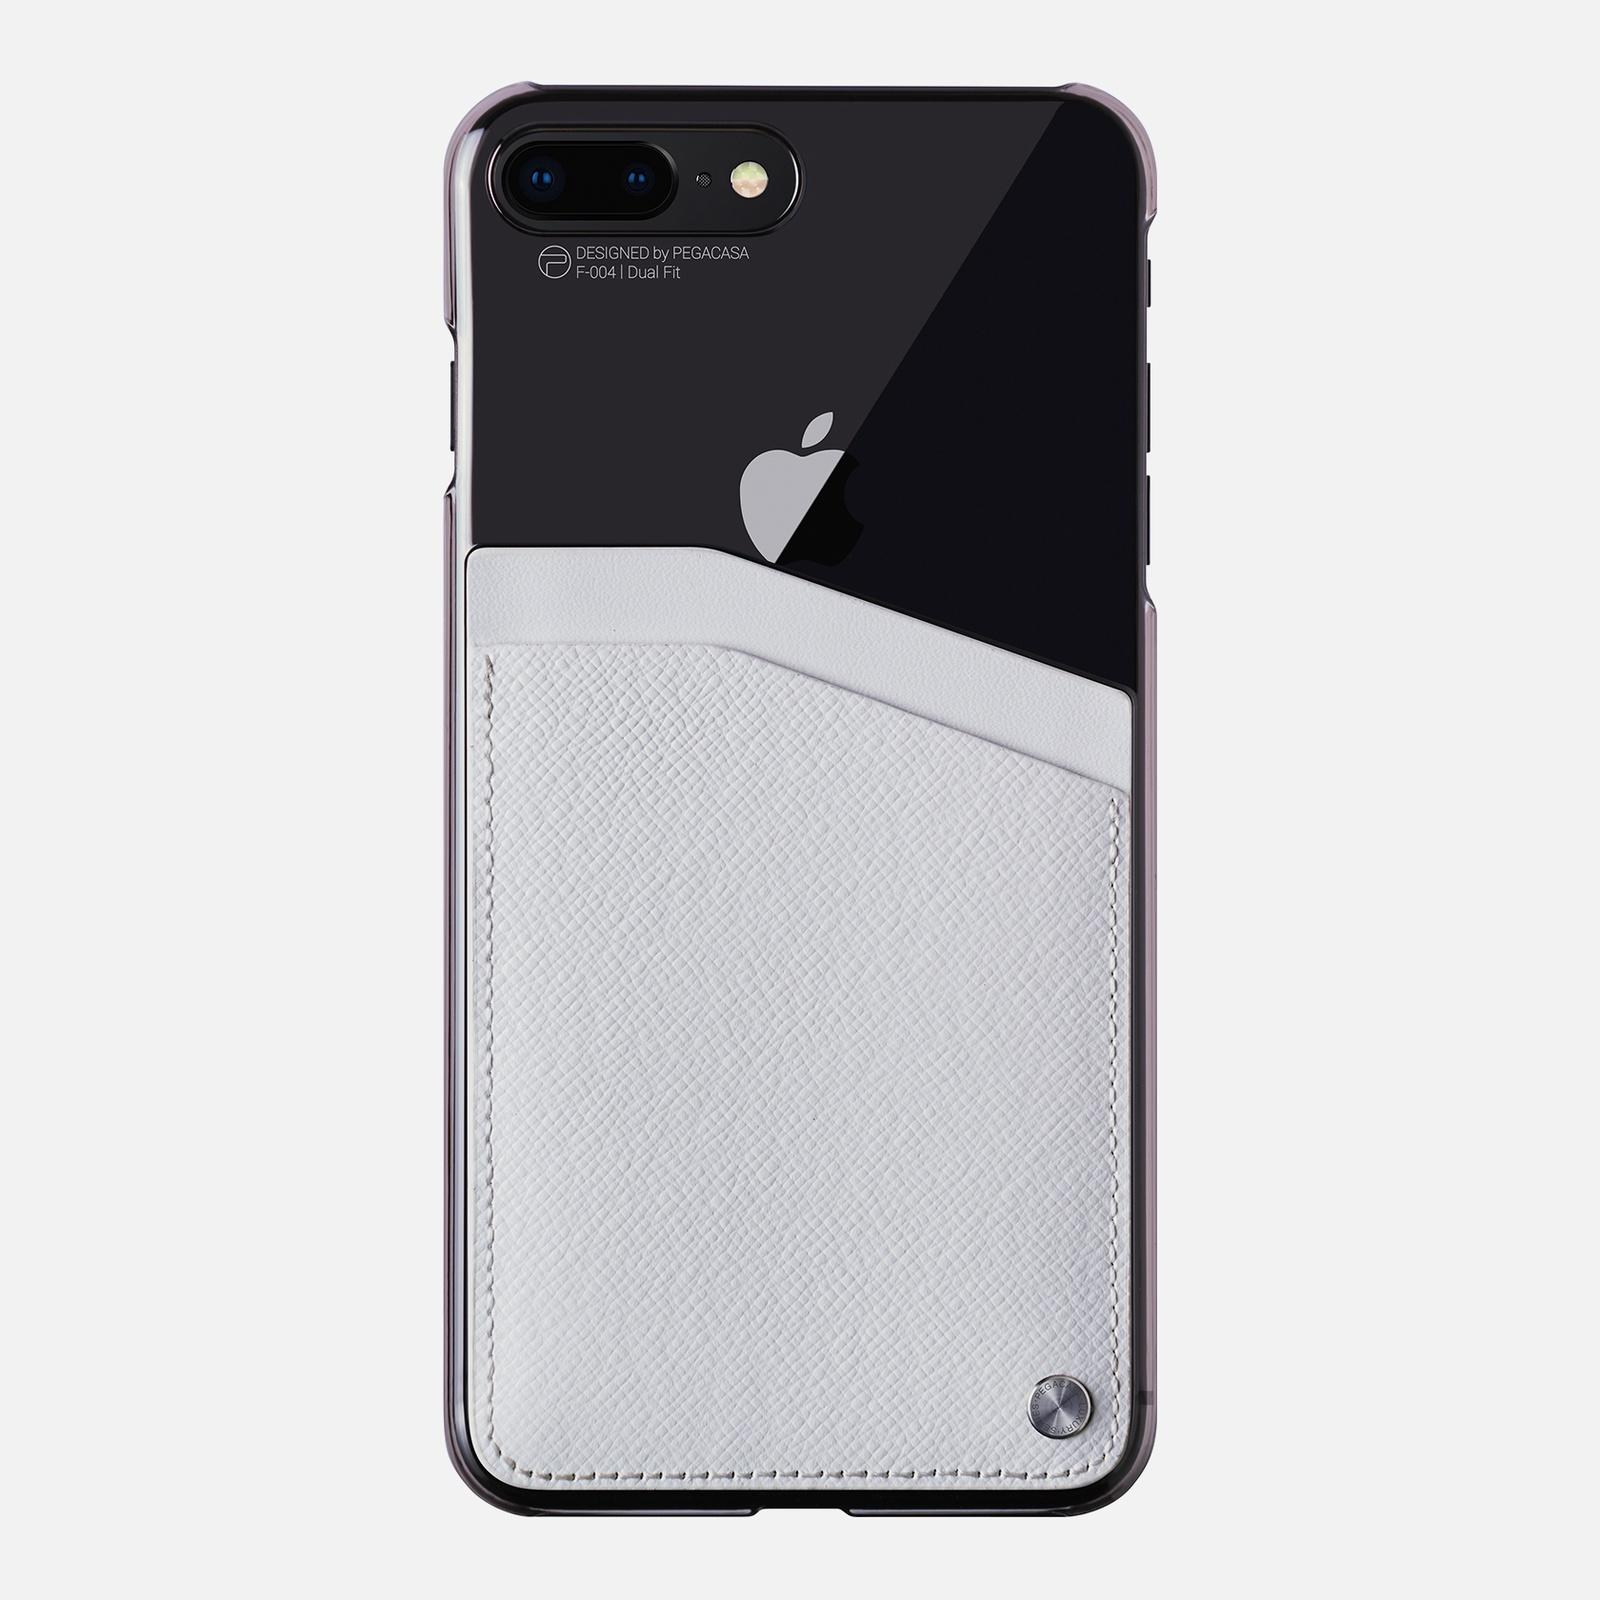 Фото - Чехол для сотового телефона PEGACASA F-004 Dual Fit для iPhone 7/8 Plus, белый calmoon 004 high quality dual ring detachable keychain keyring black silver